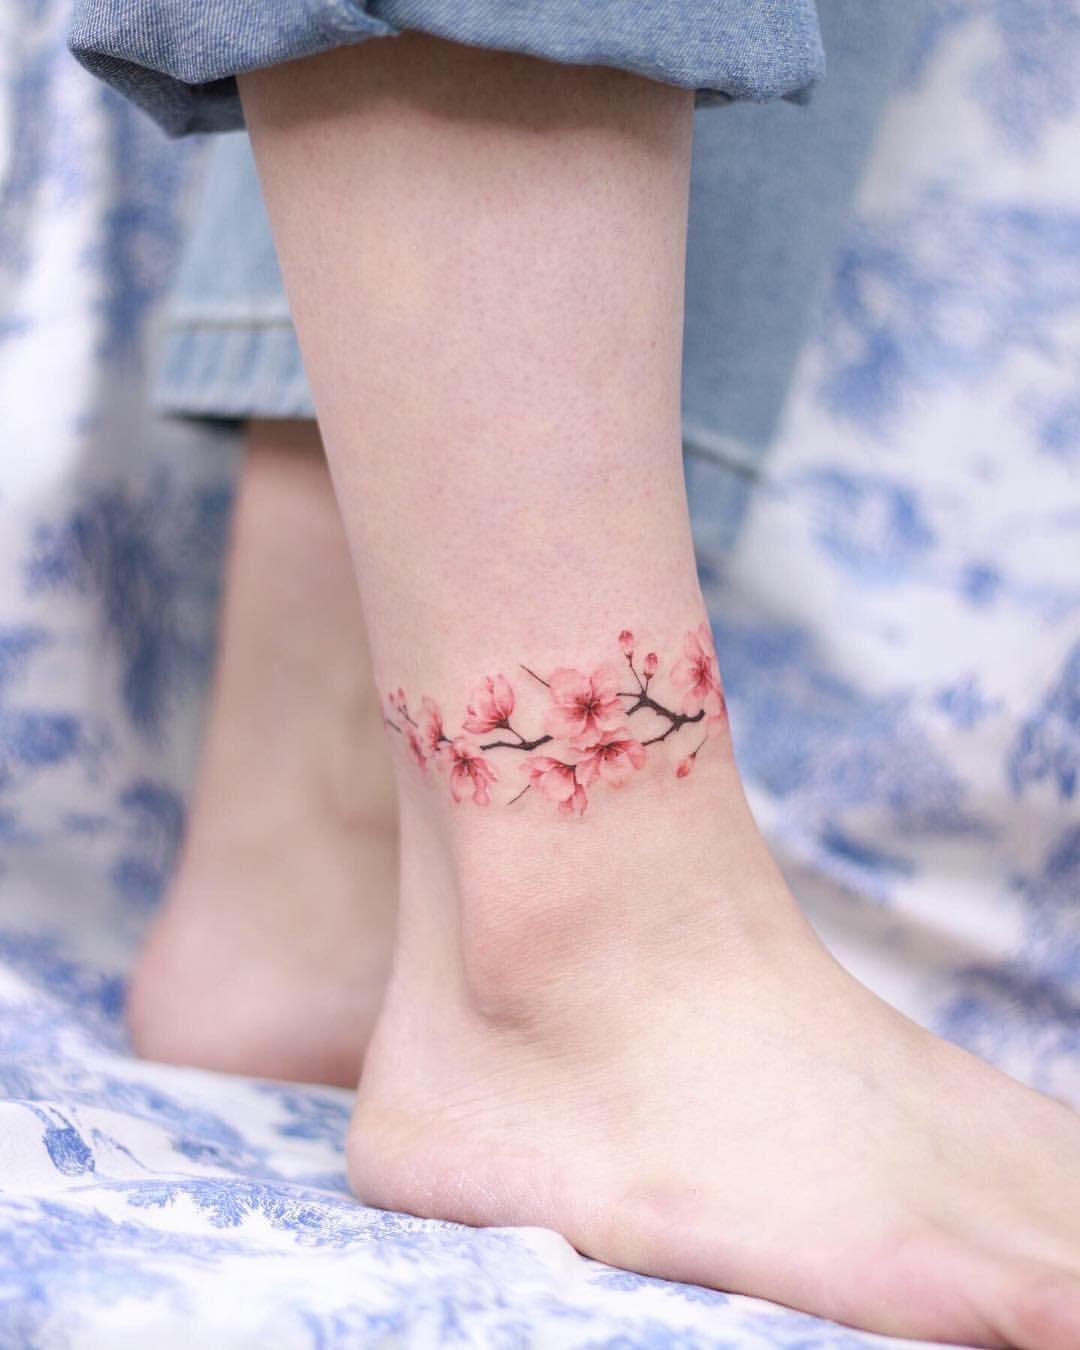 Flower Anklet Tattoo Studiobysol Donghwa Tattoo Studiobysol Koreantattoo Koreantattooshop Flow Skin Color Tattoos Anklet Tattoos Ankle Tattoo Designs